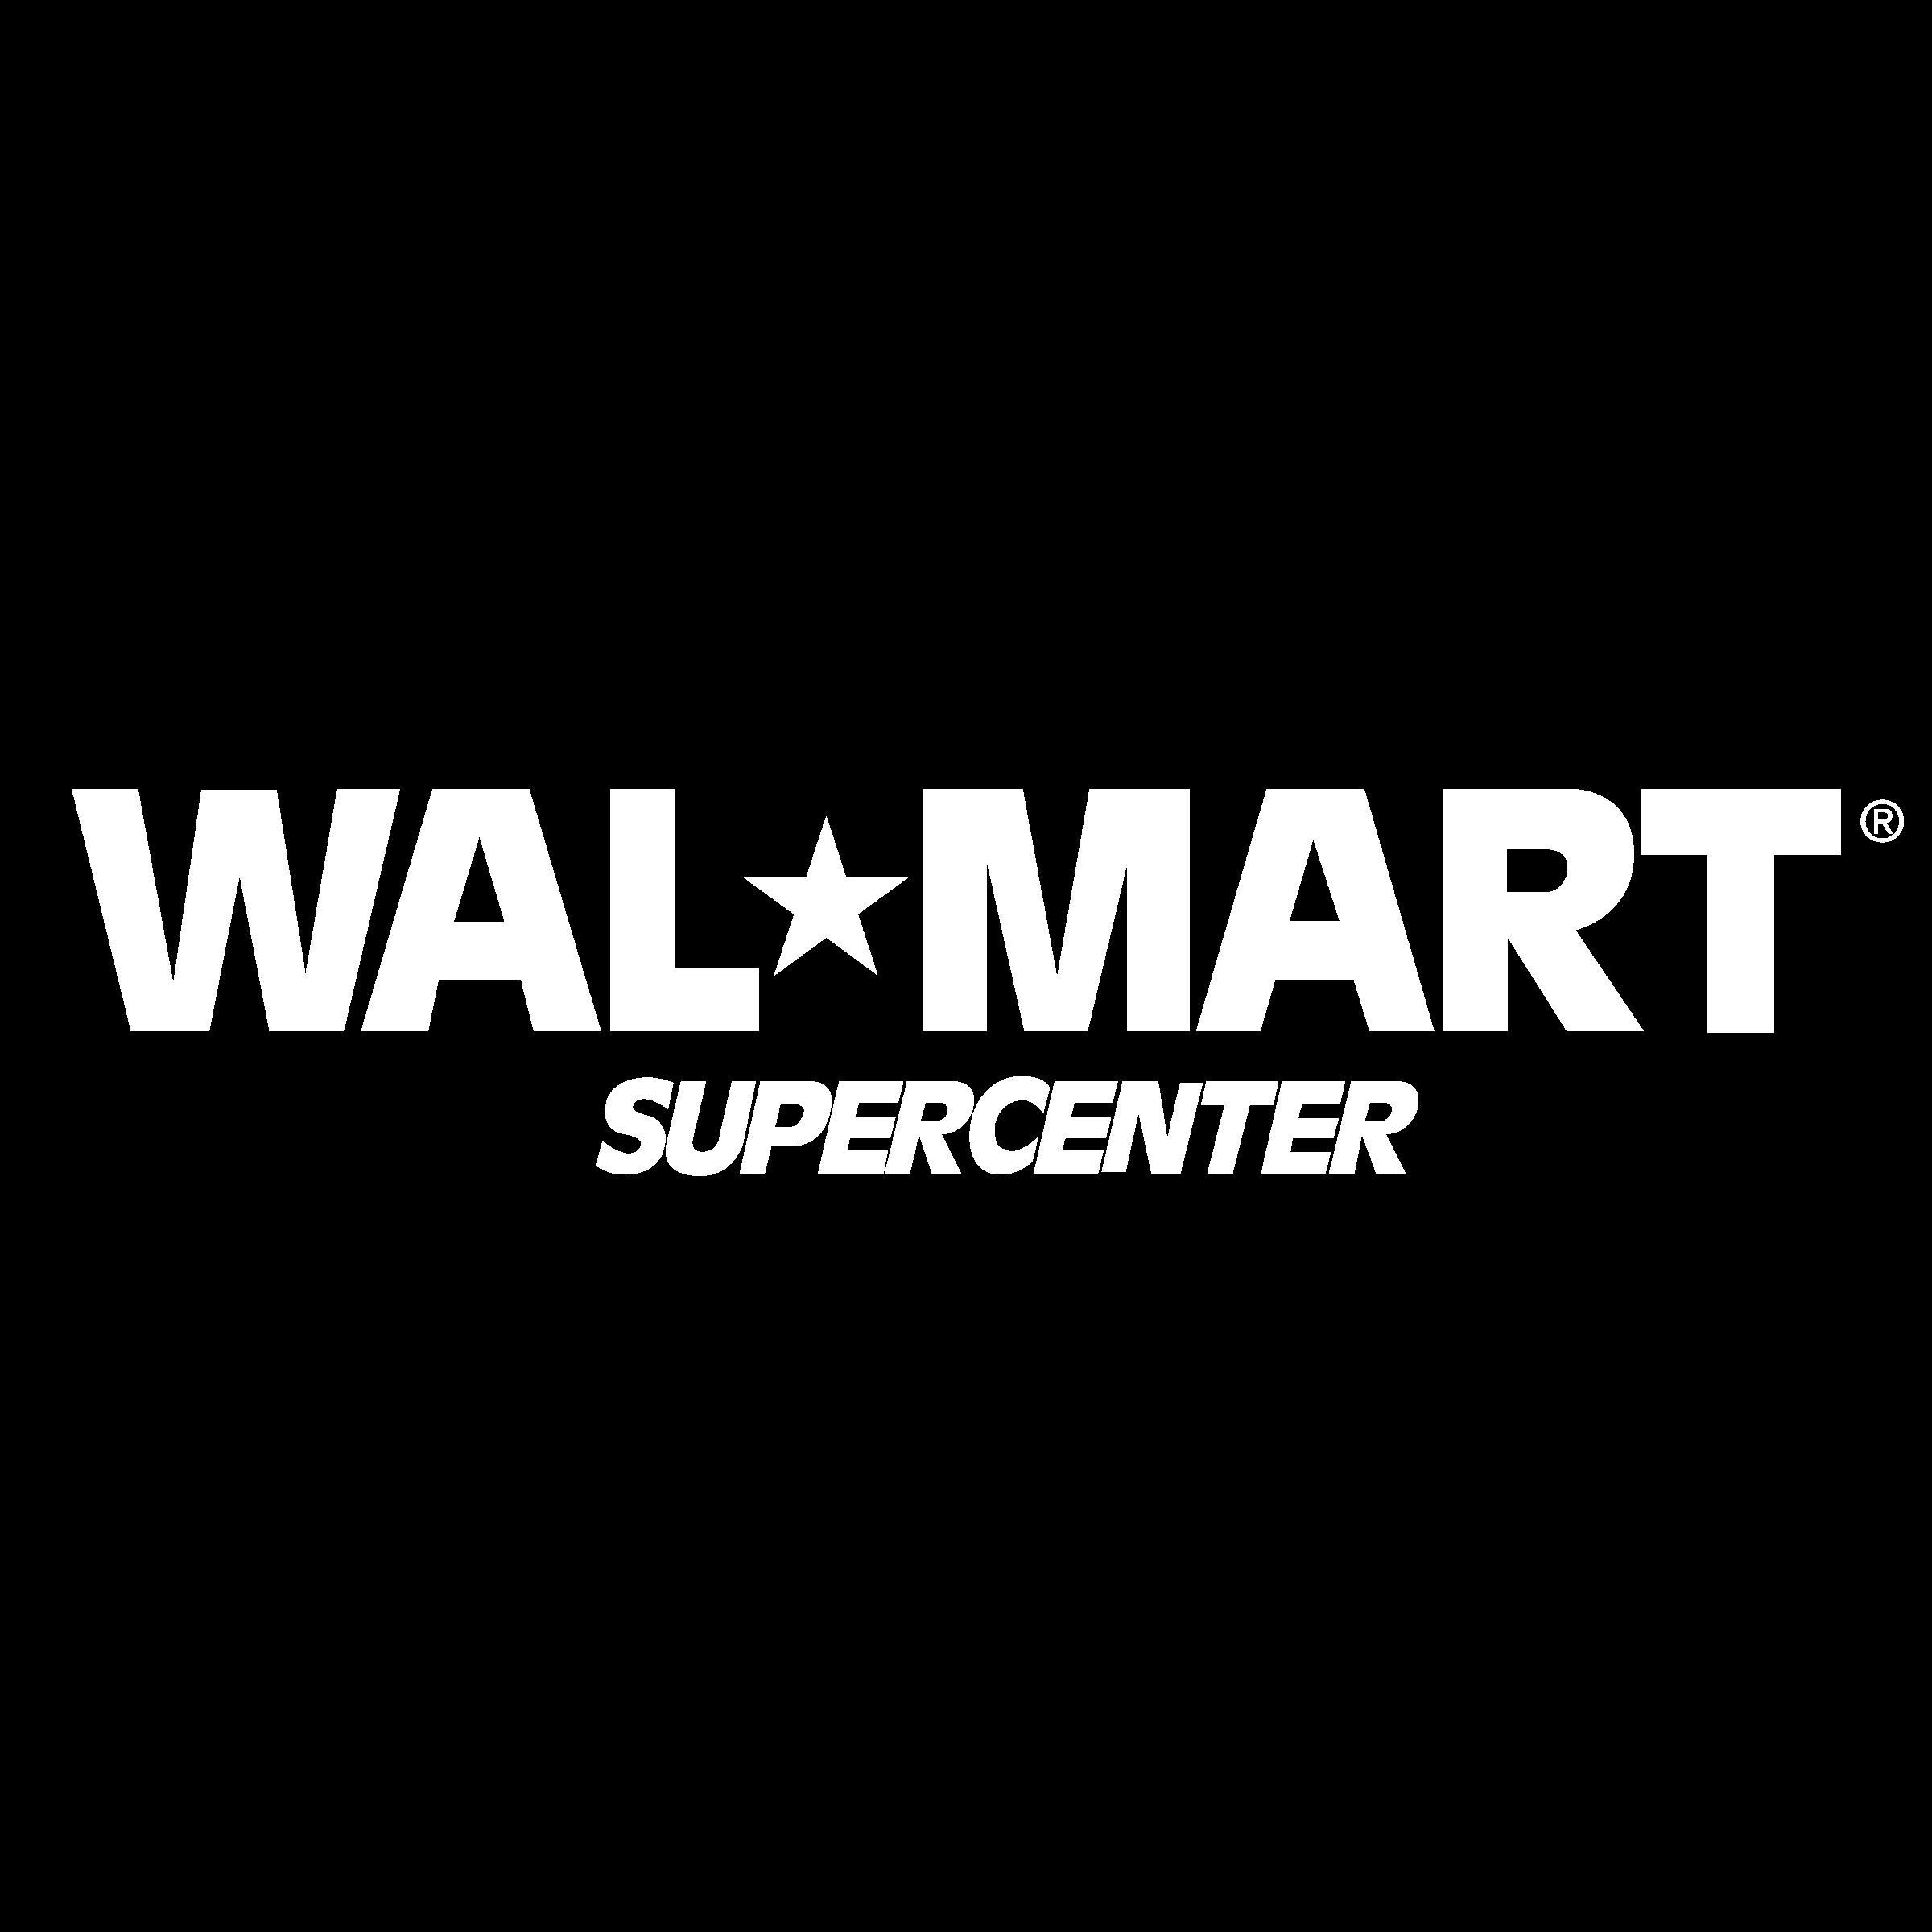 Wal Mart Supercenter Logo Black And White